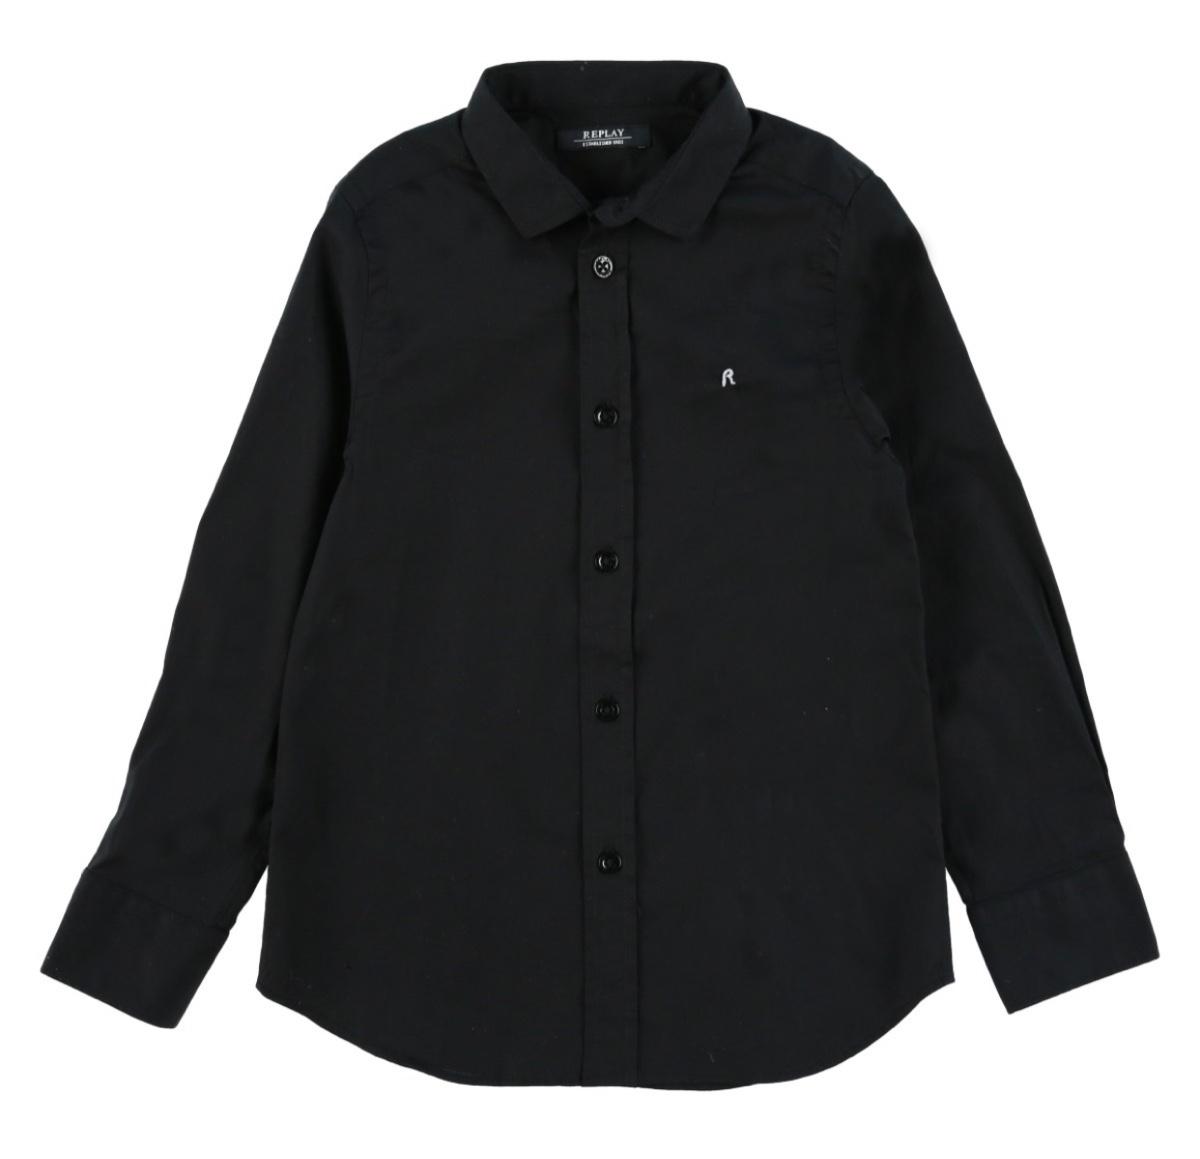 Replay חולצה שחורה אלגנט מידות 4-16